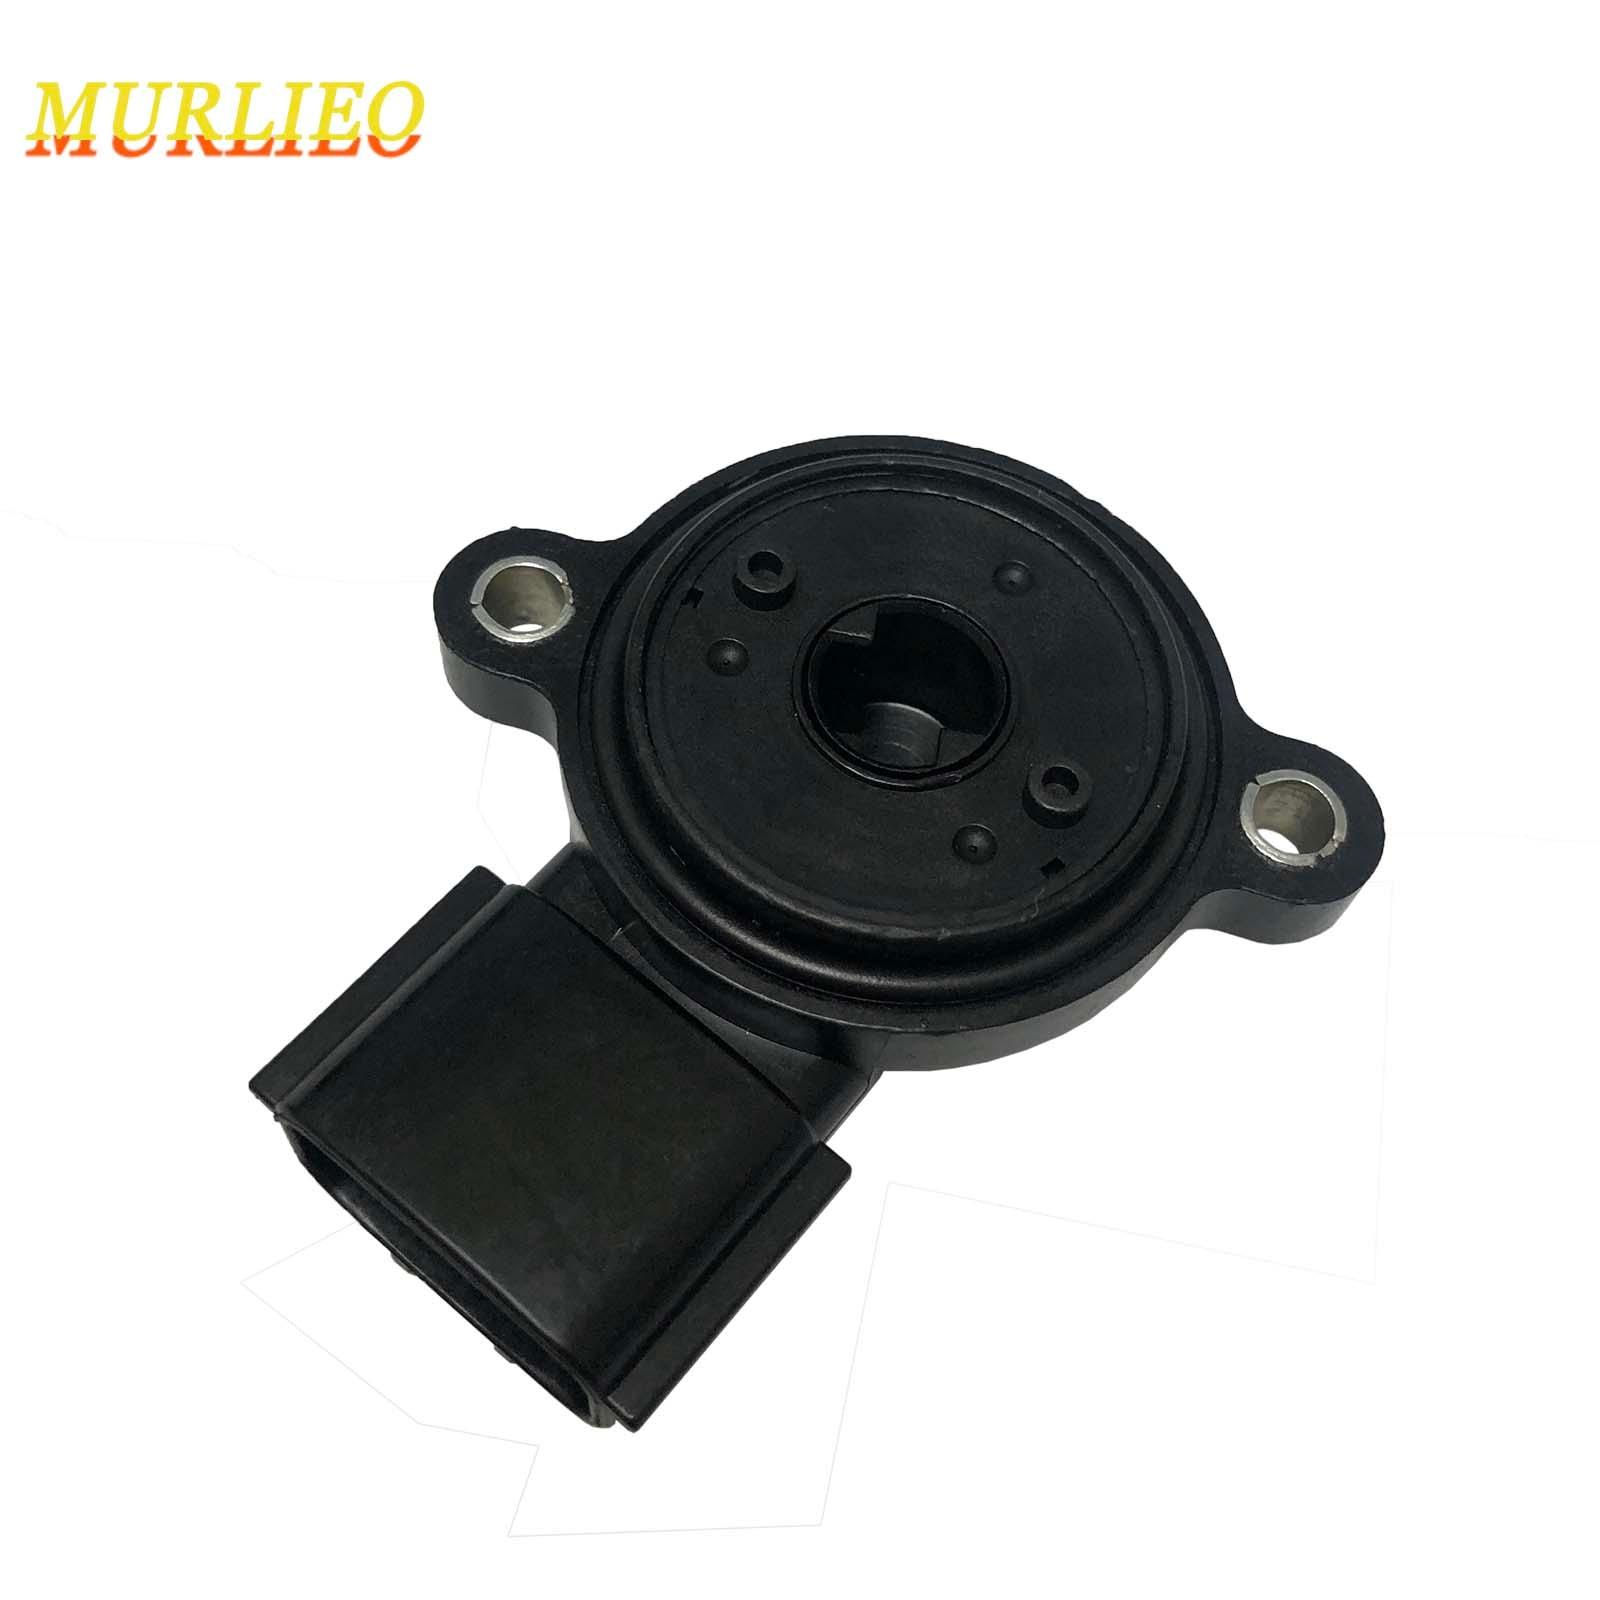 Sensor de posición de acelerador Murlieo SERA443-03 SERA44303 22633AA230 22633-AA230 compatible con Subaru Forester SG5 EJ202